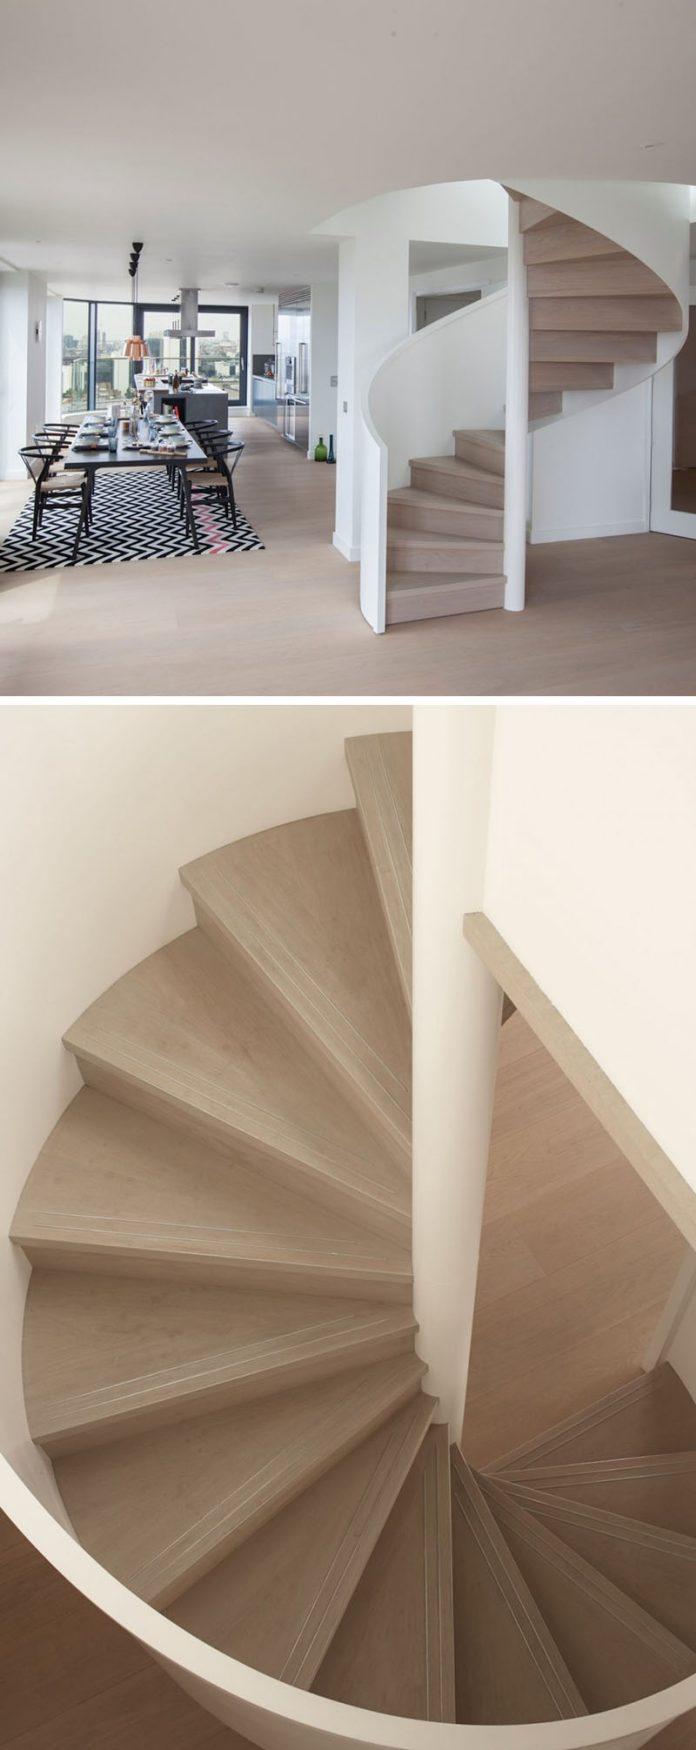 Light oak steps